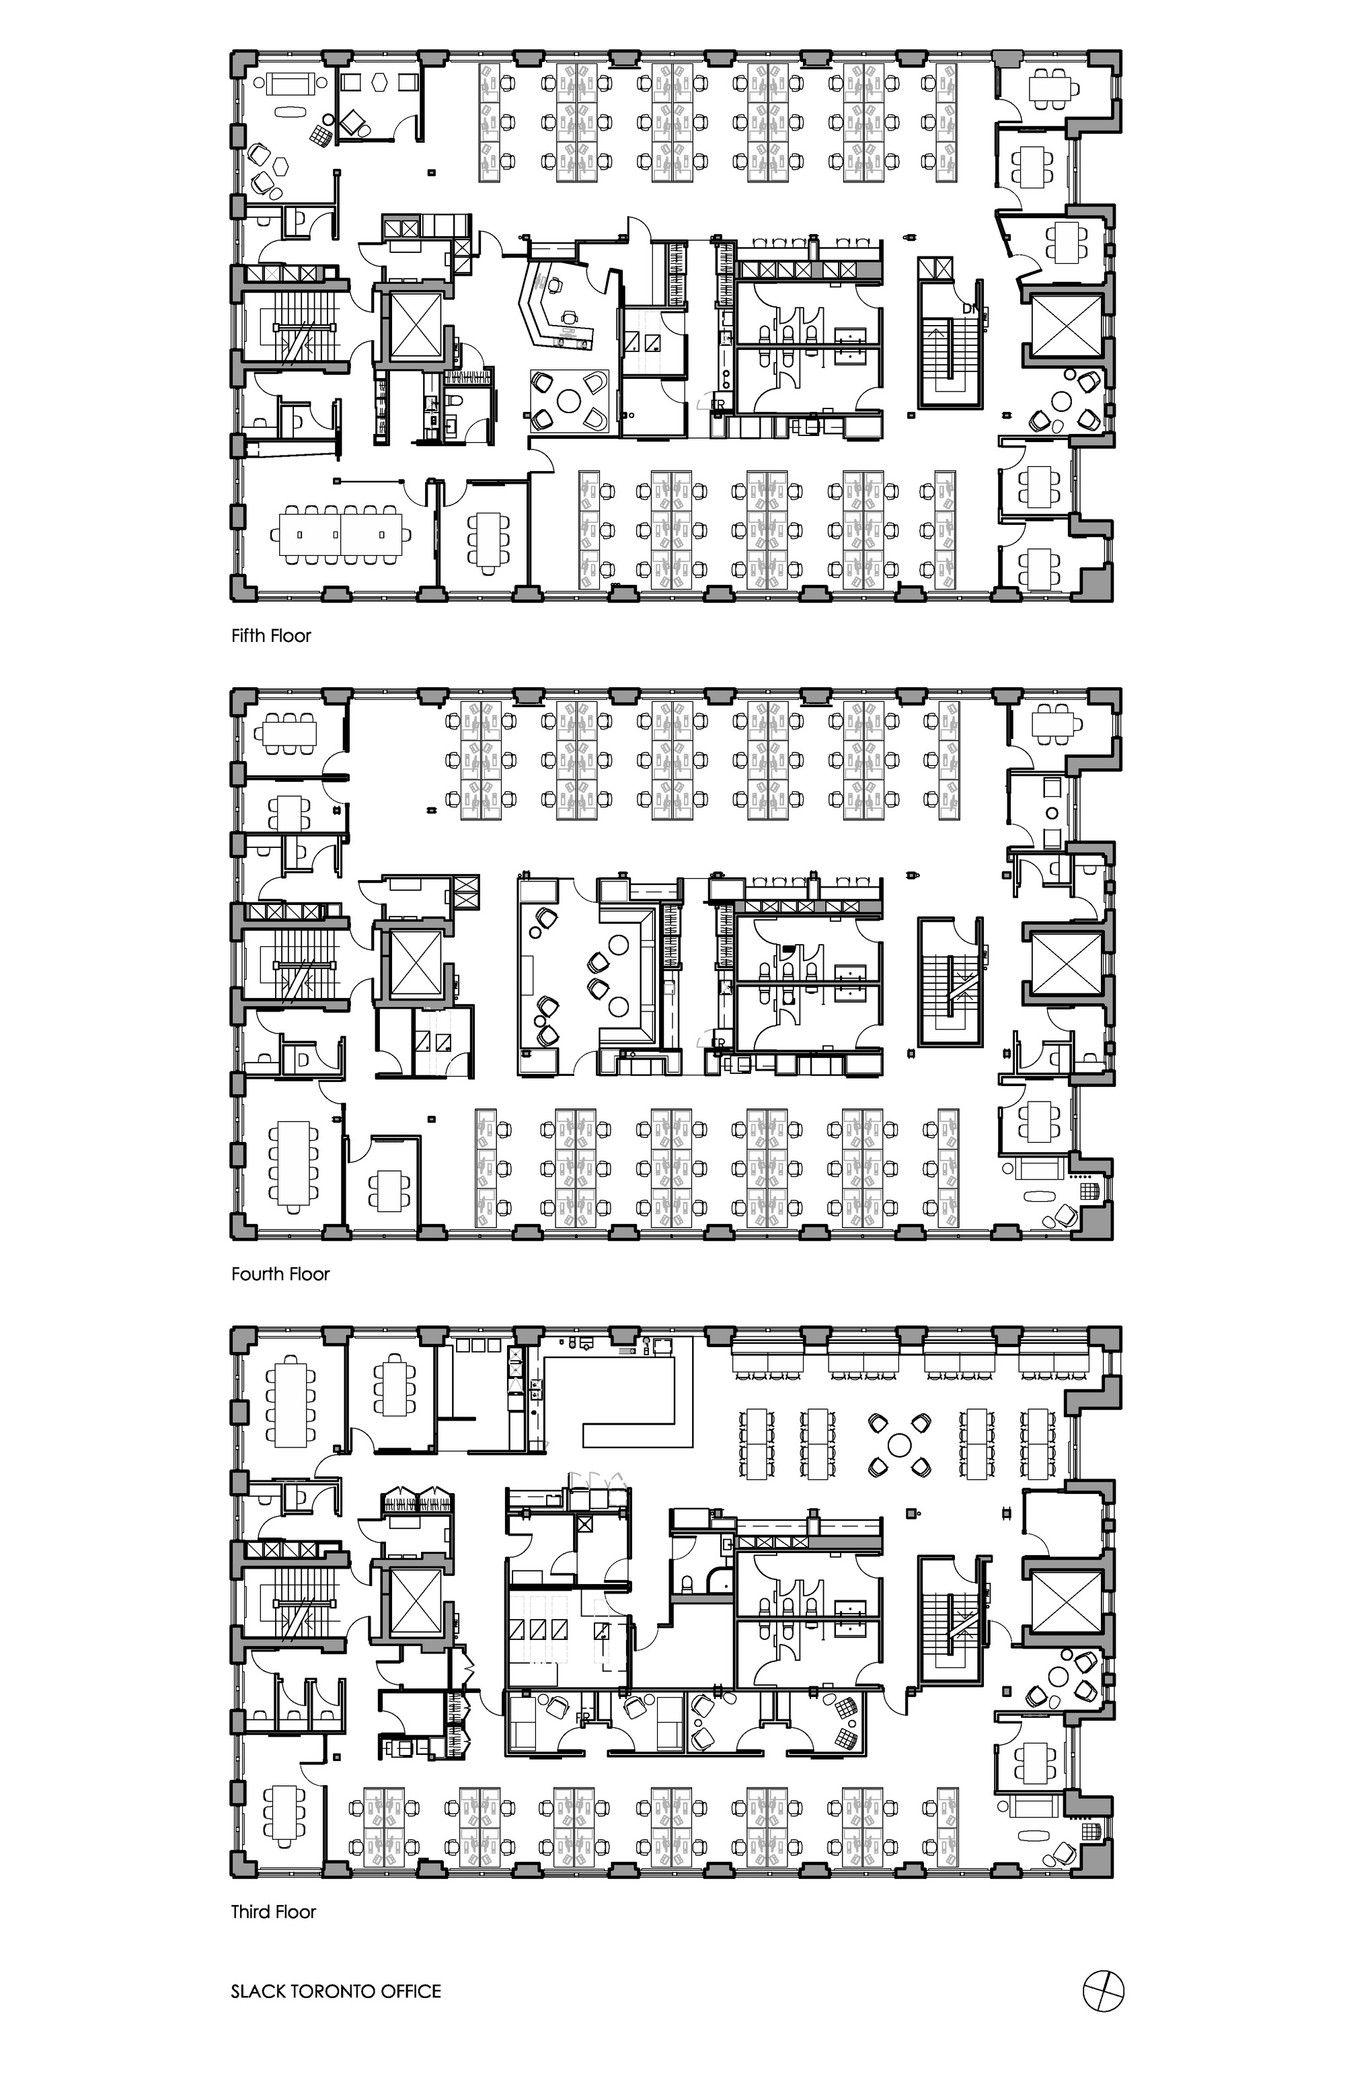 Slack Toronto Office Dubbeldam Architecture Design Arch2o Com Office Floor Plan Office Building Plans Building Design Plan